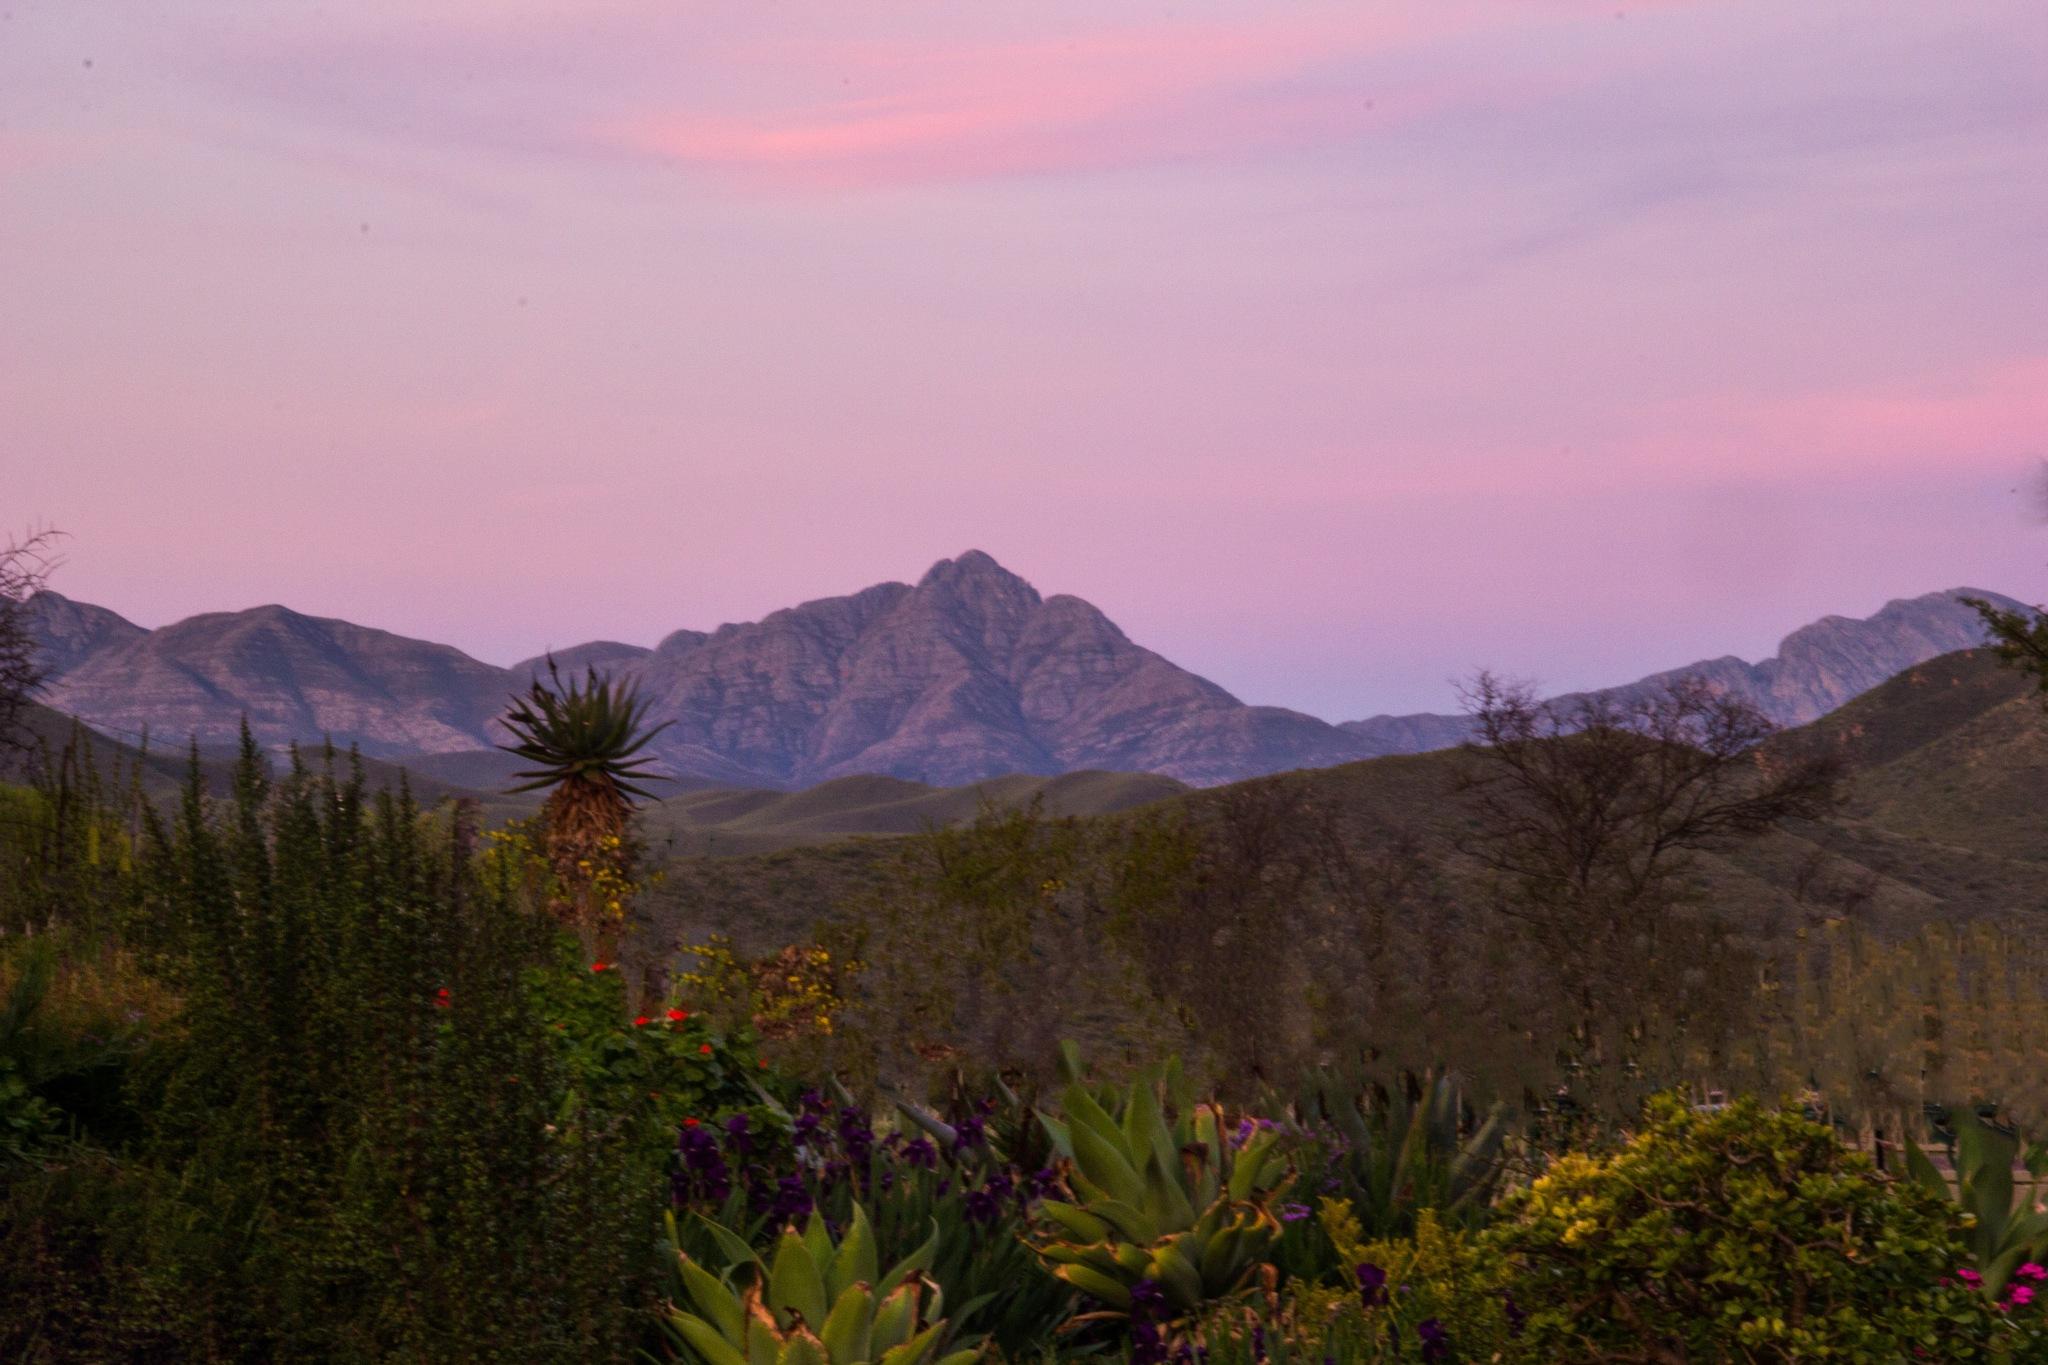 Garden and mountain peak by Nauta Piscatorque